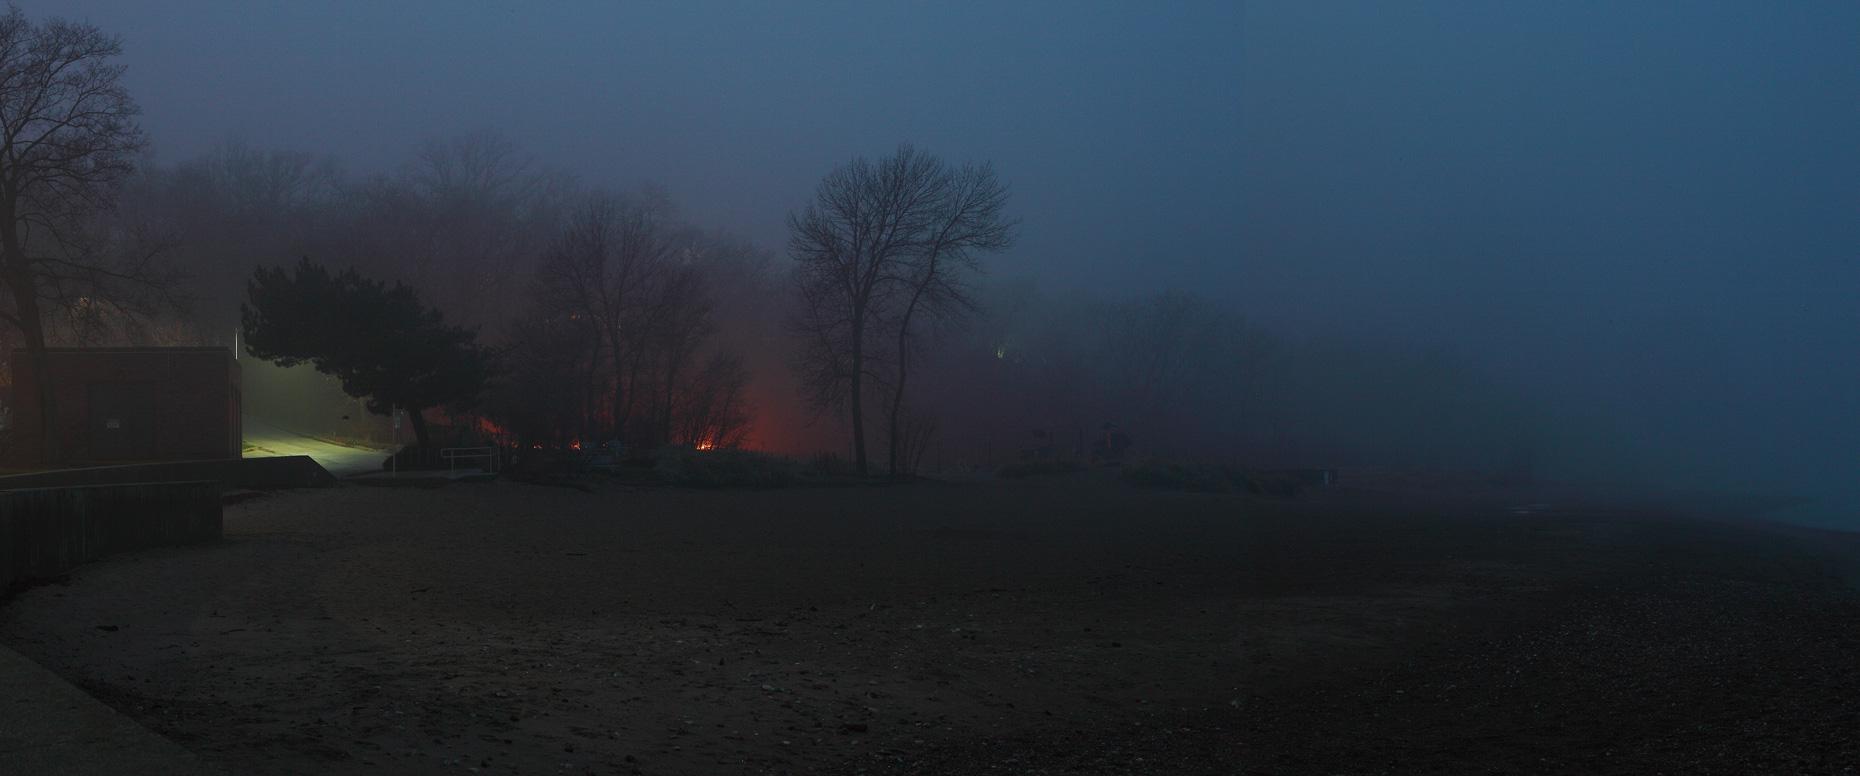 fogscape2.jpg